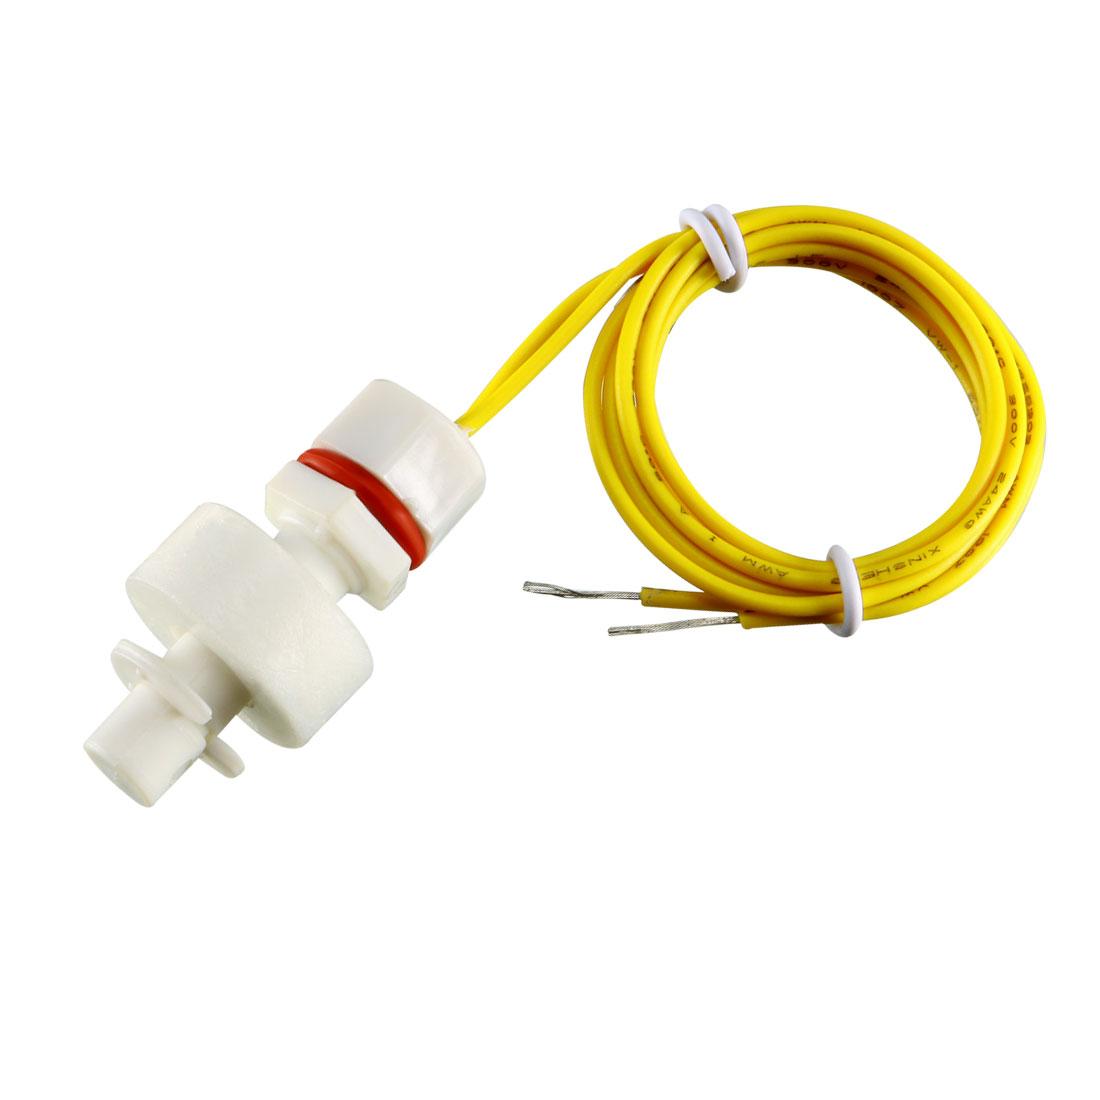 10 x Mini Water Liquid Level Sensor Vertical Float Switch 36mm ZP2508